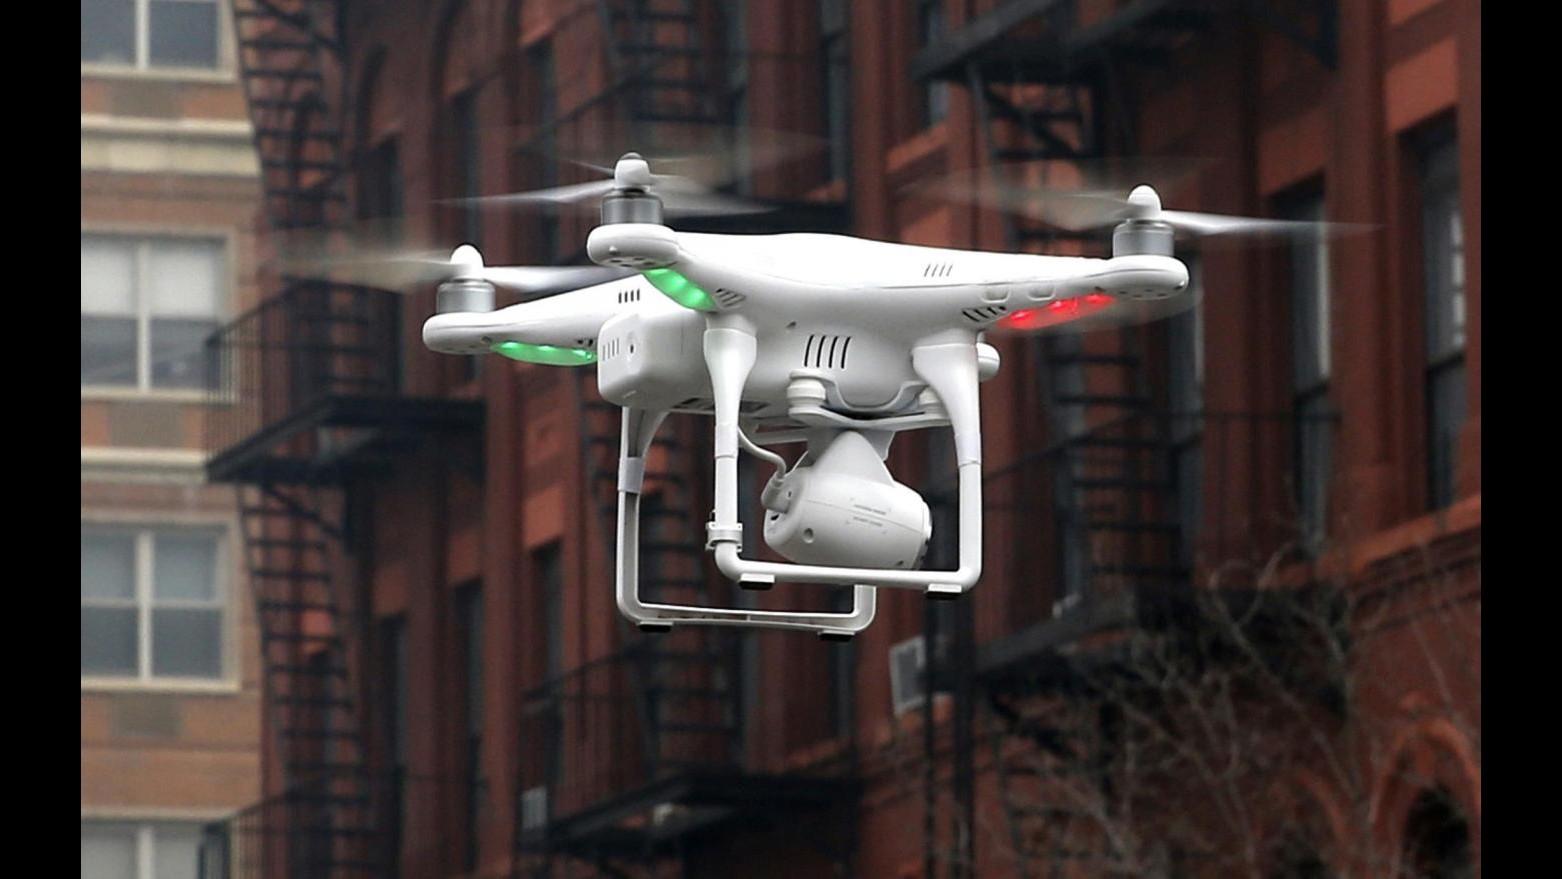 Francia, 5 droni hanno sorvolato punti strategici Parigi